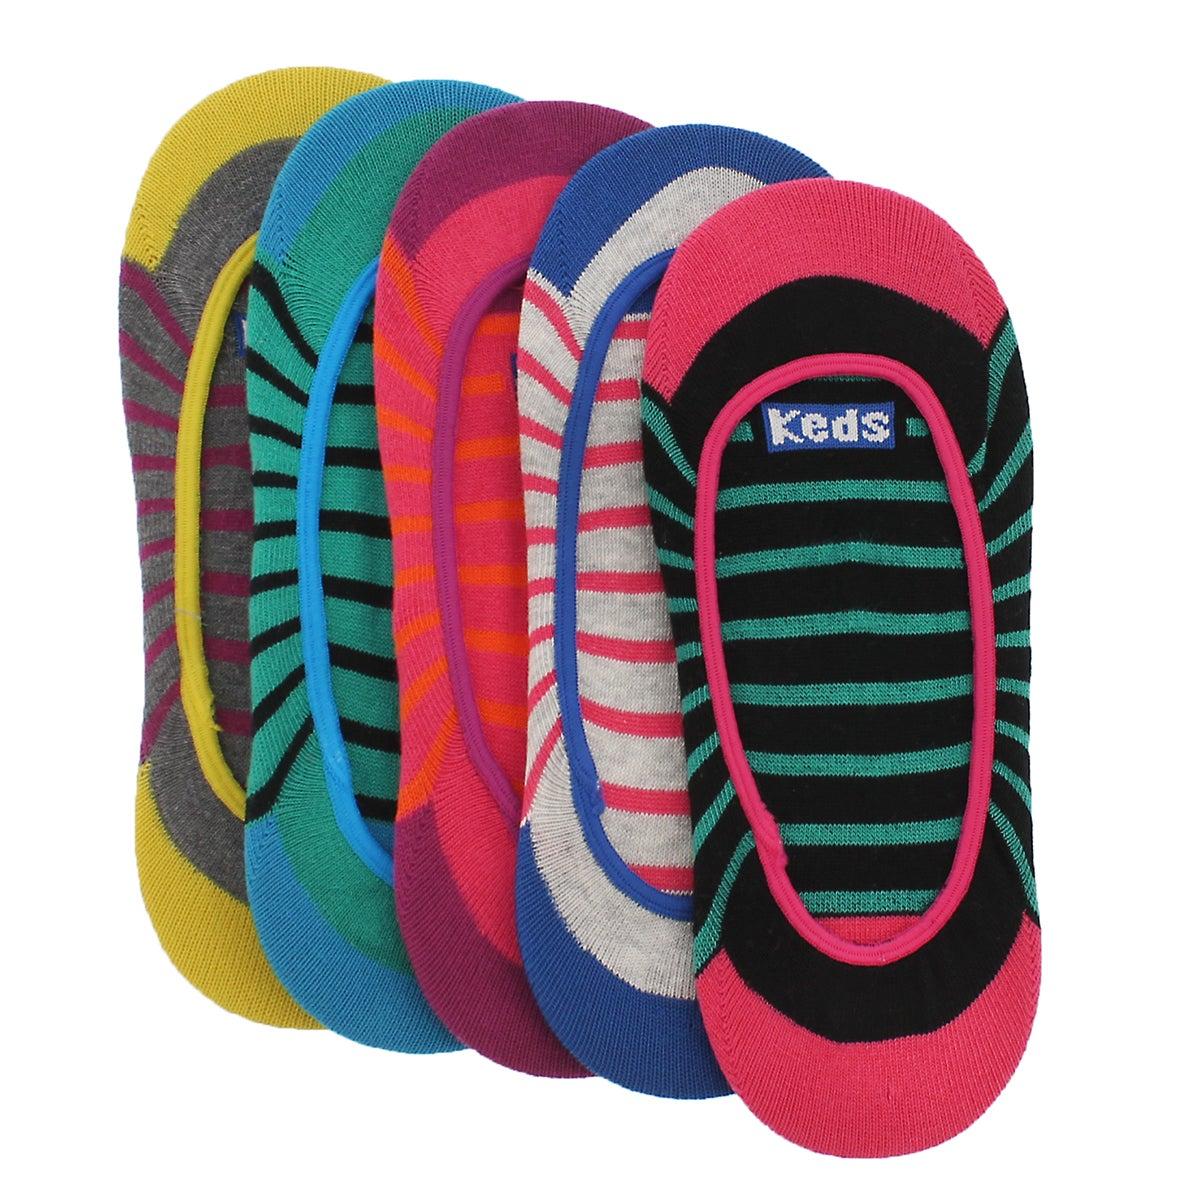 Women's JETSETTER stripe multi liners - 5pk